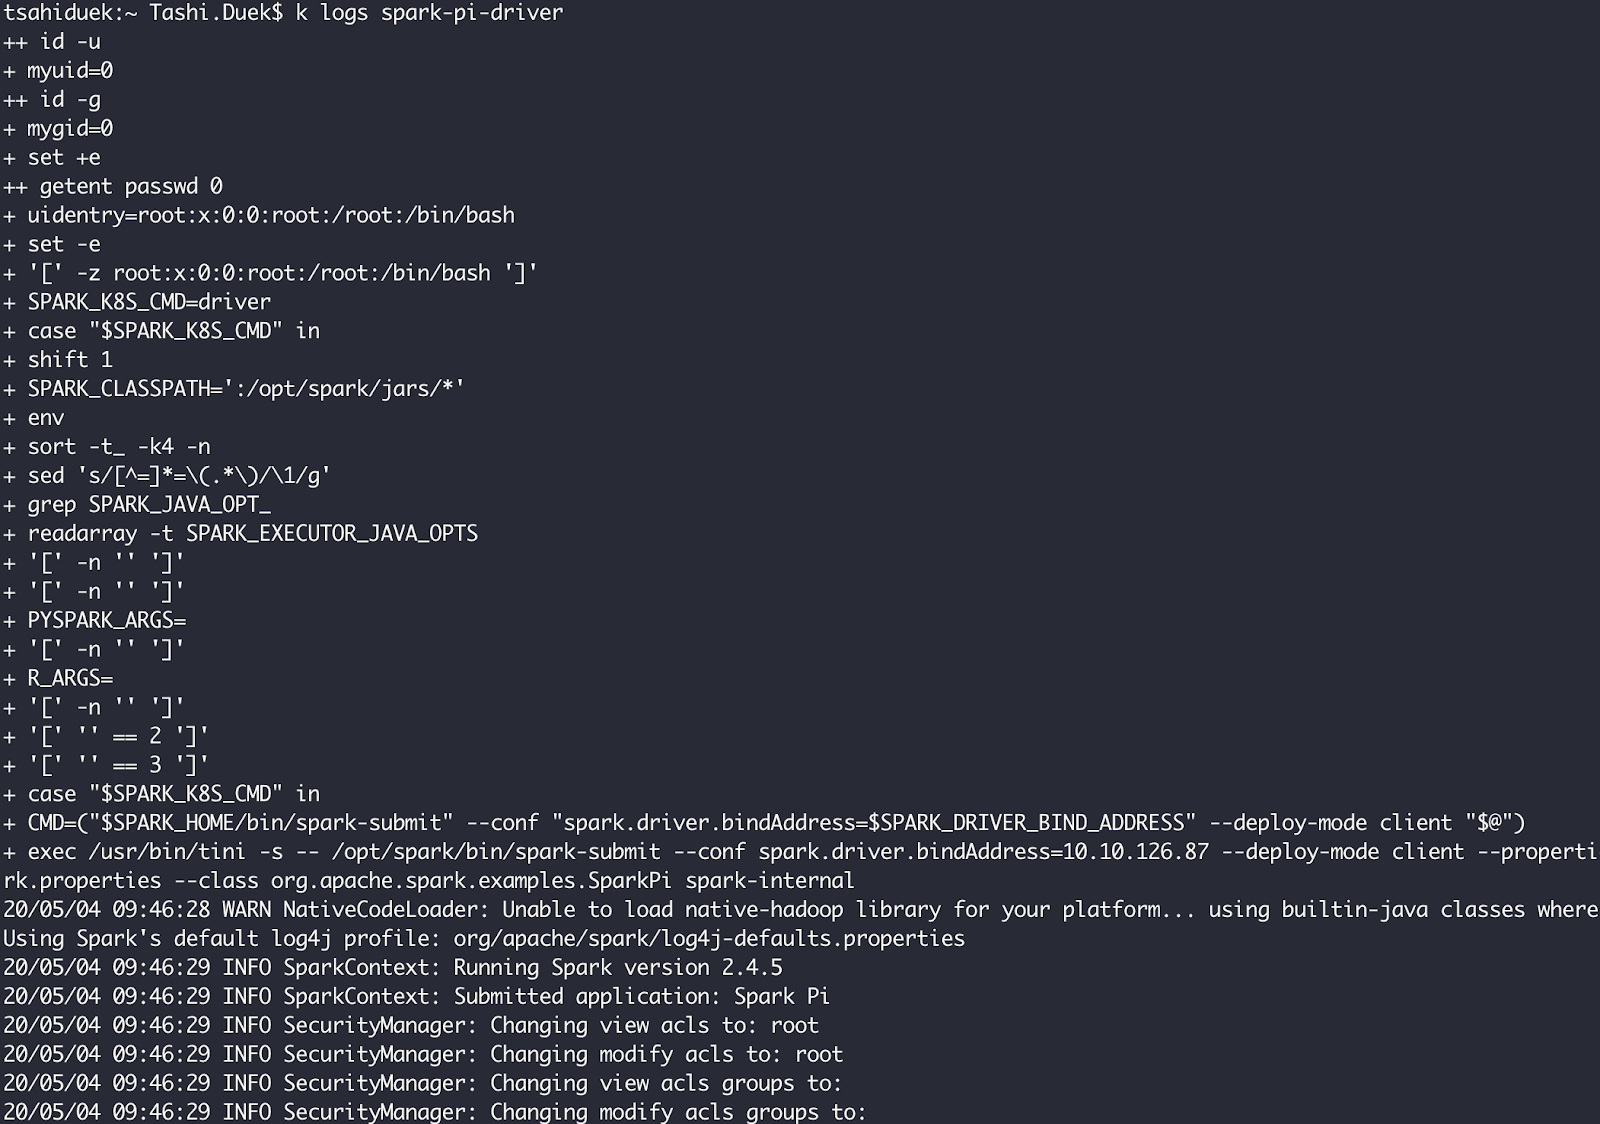 Apache Spark driver pod logs